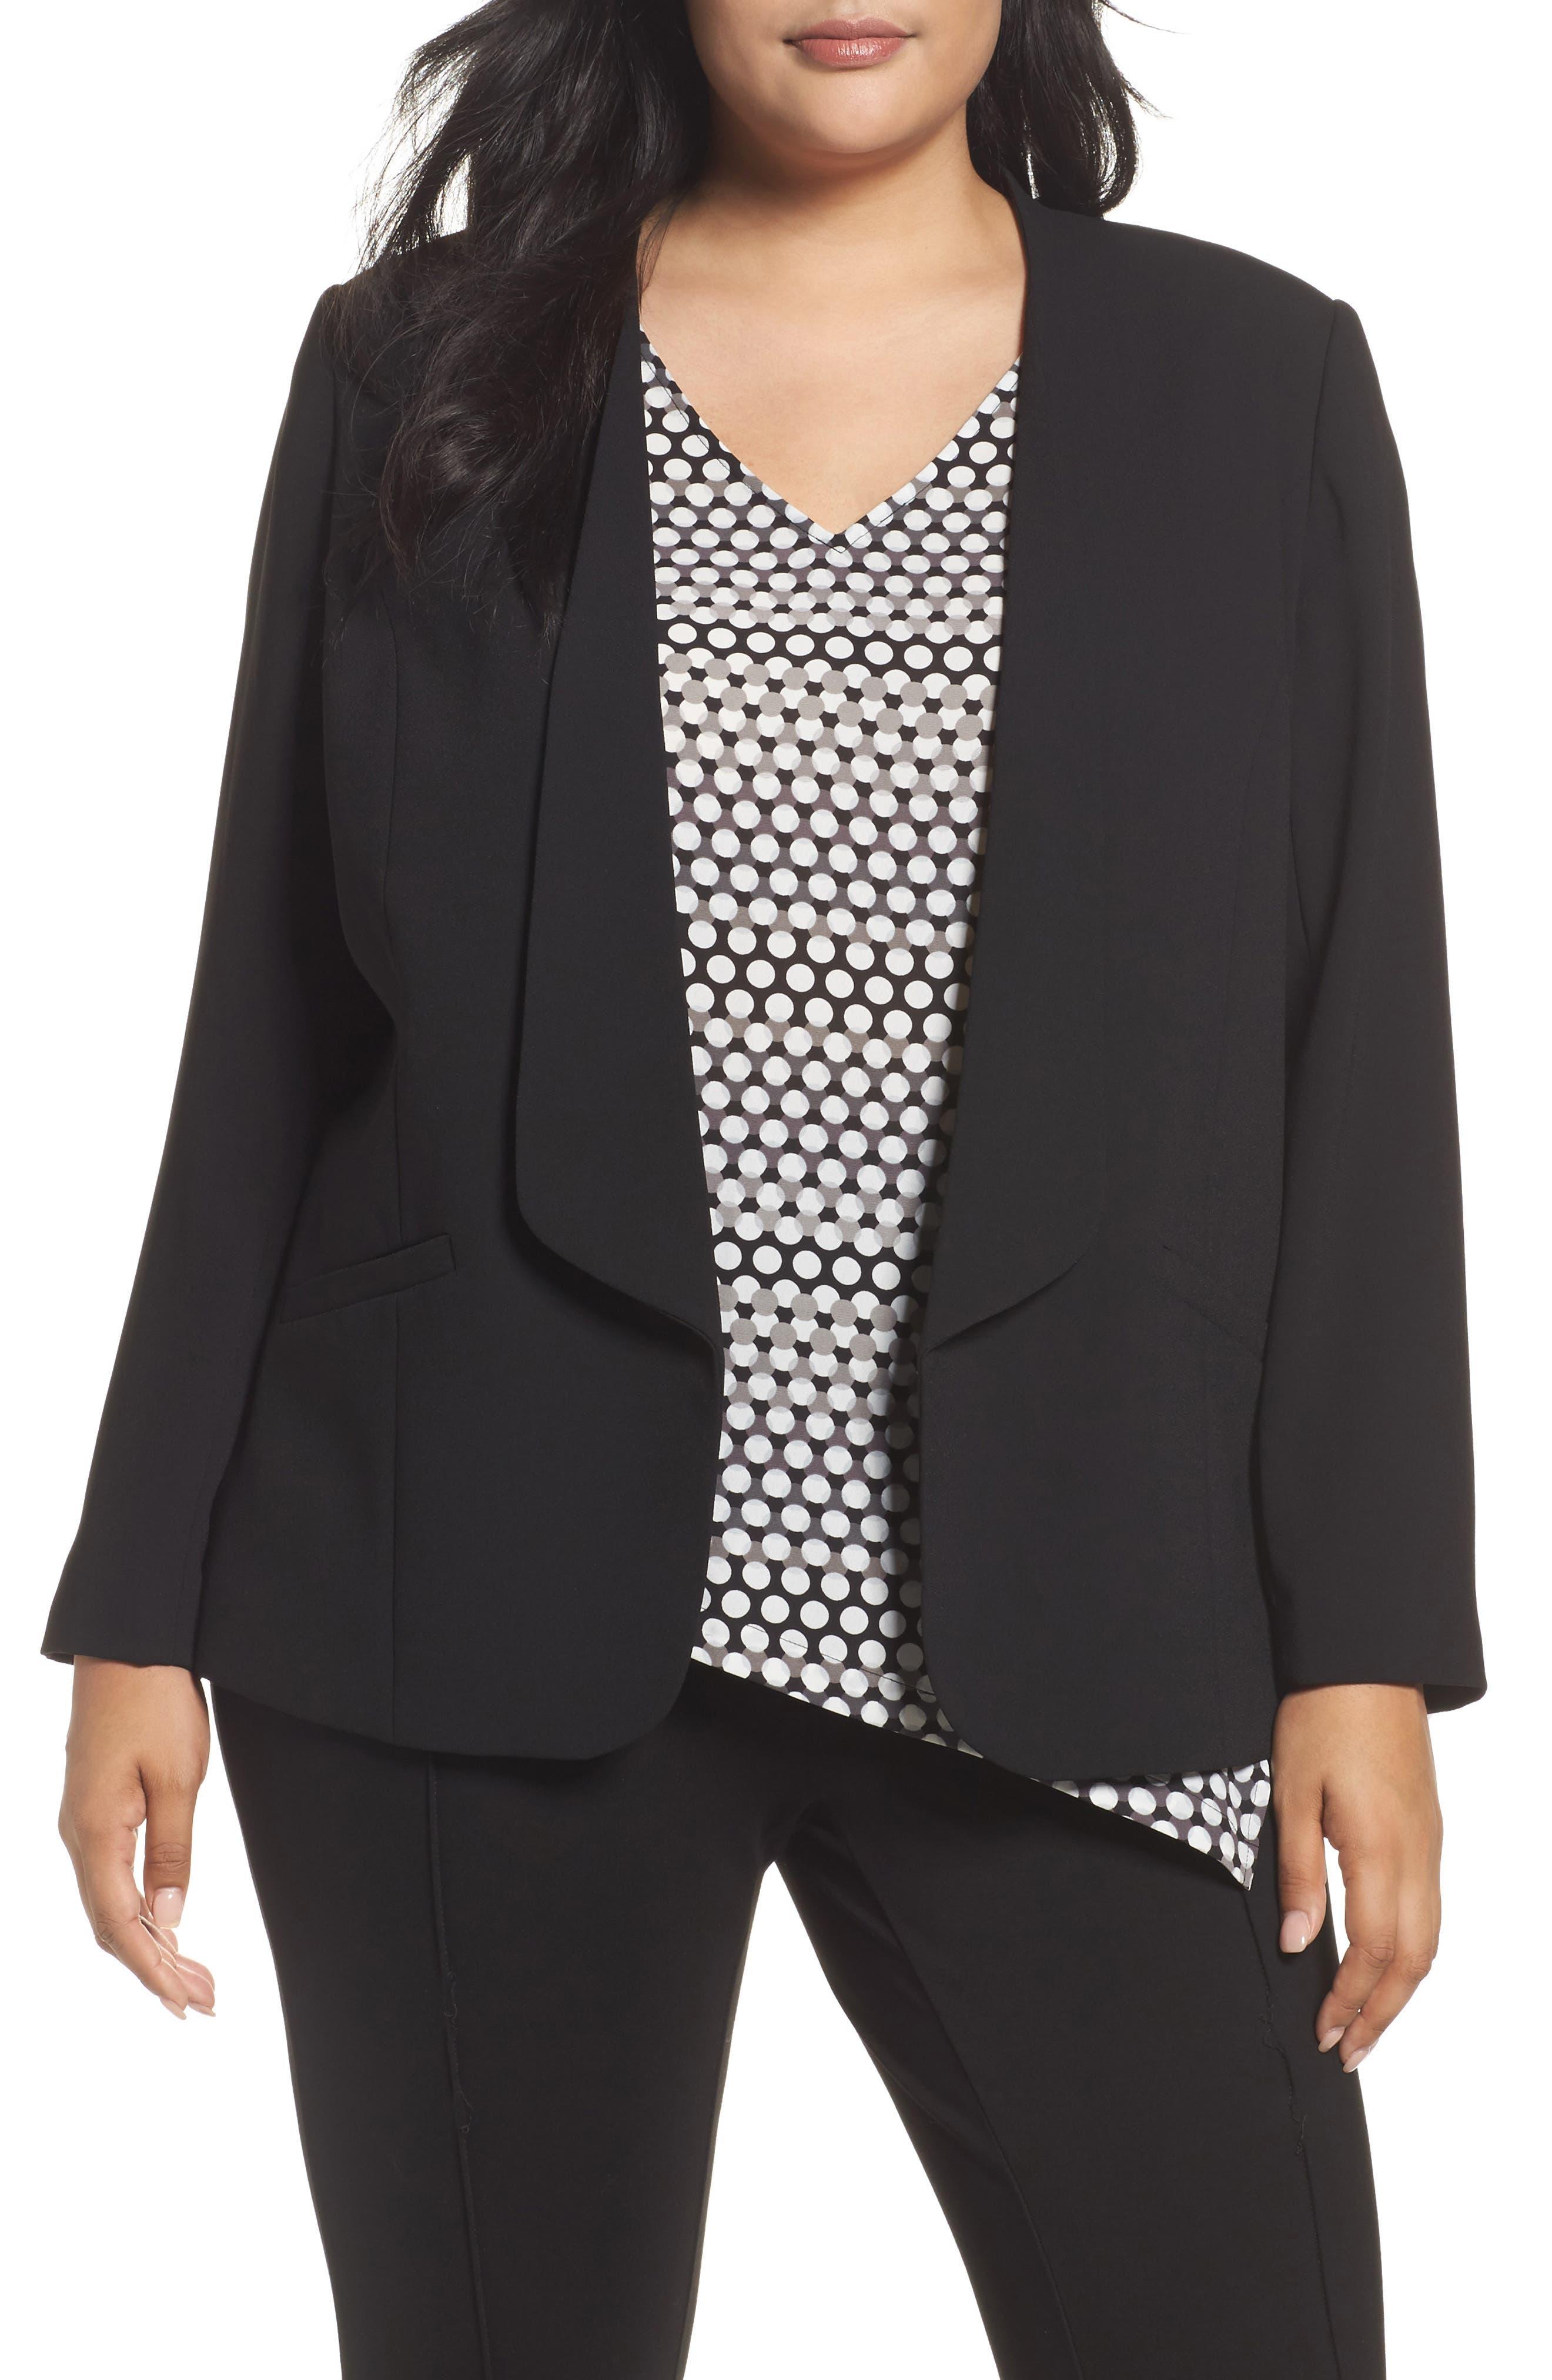 Alternate Image 1 Selected - Sejour Drape Front Crepe Jacket (Plus Size)